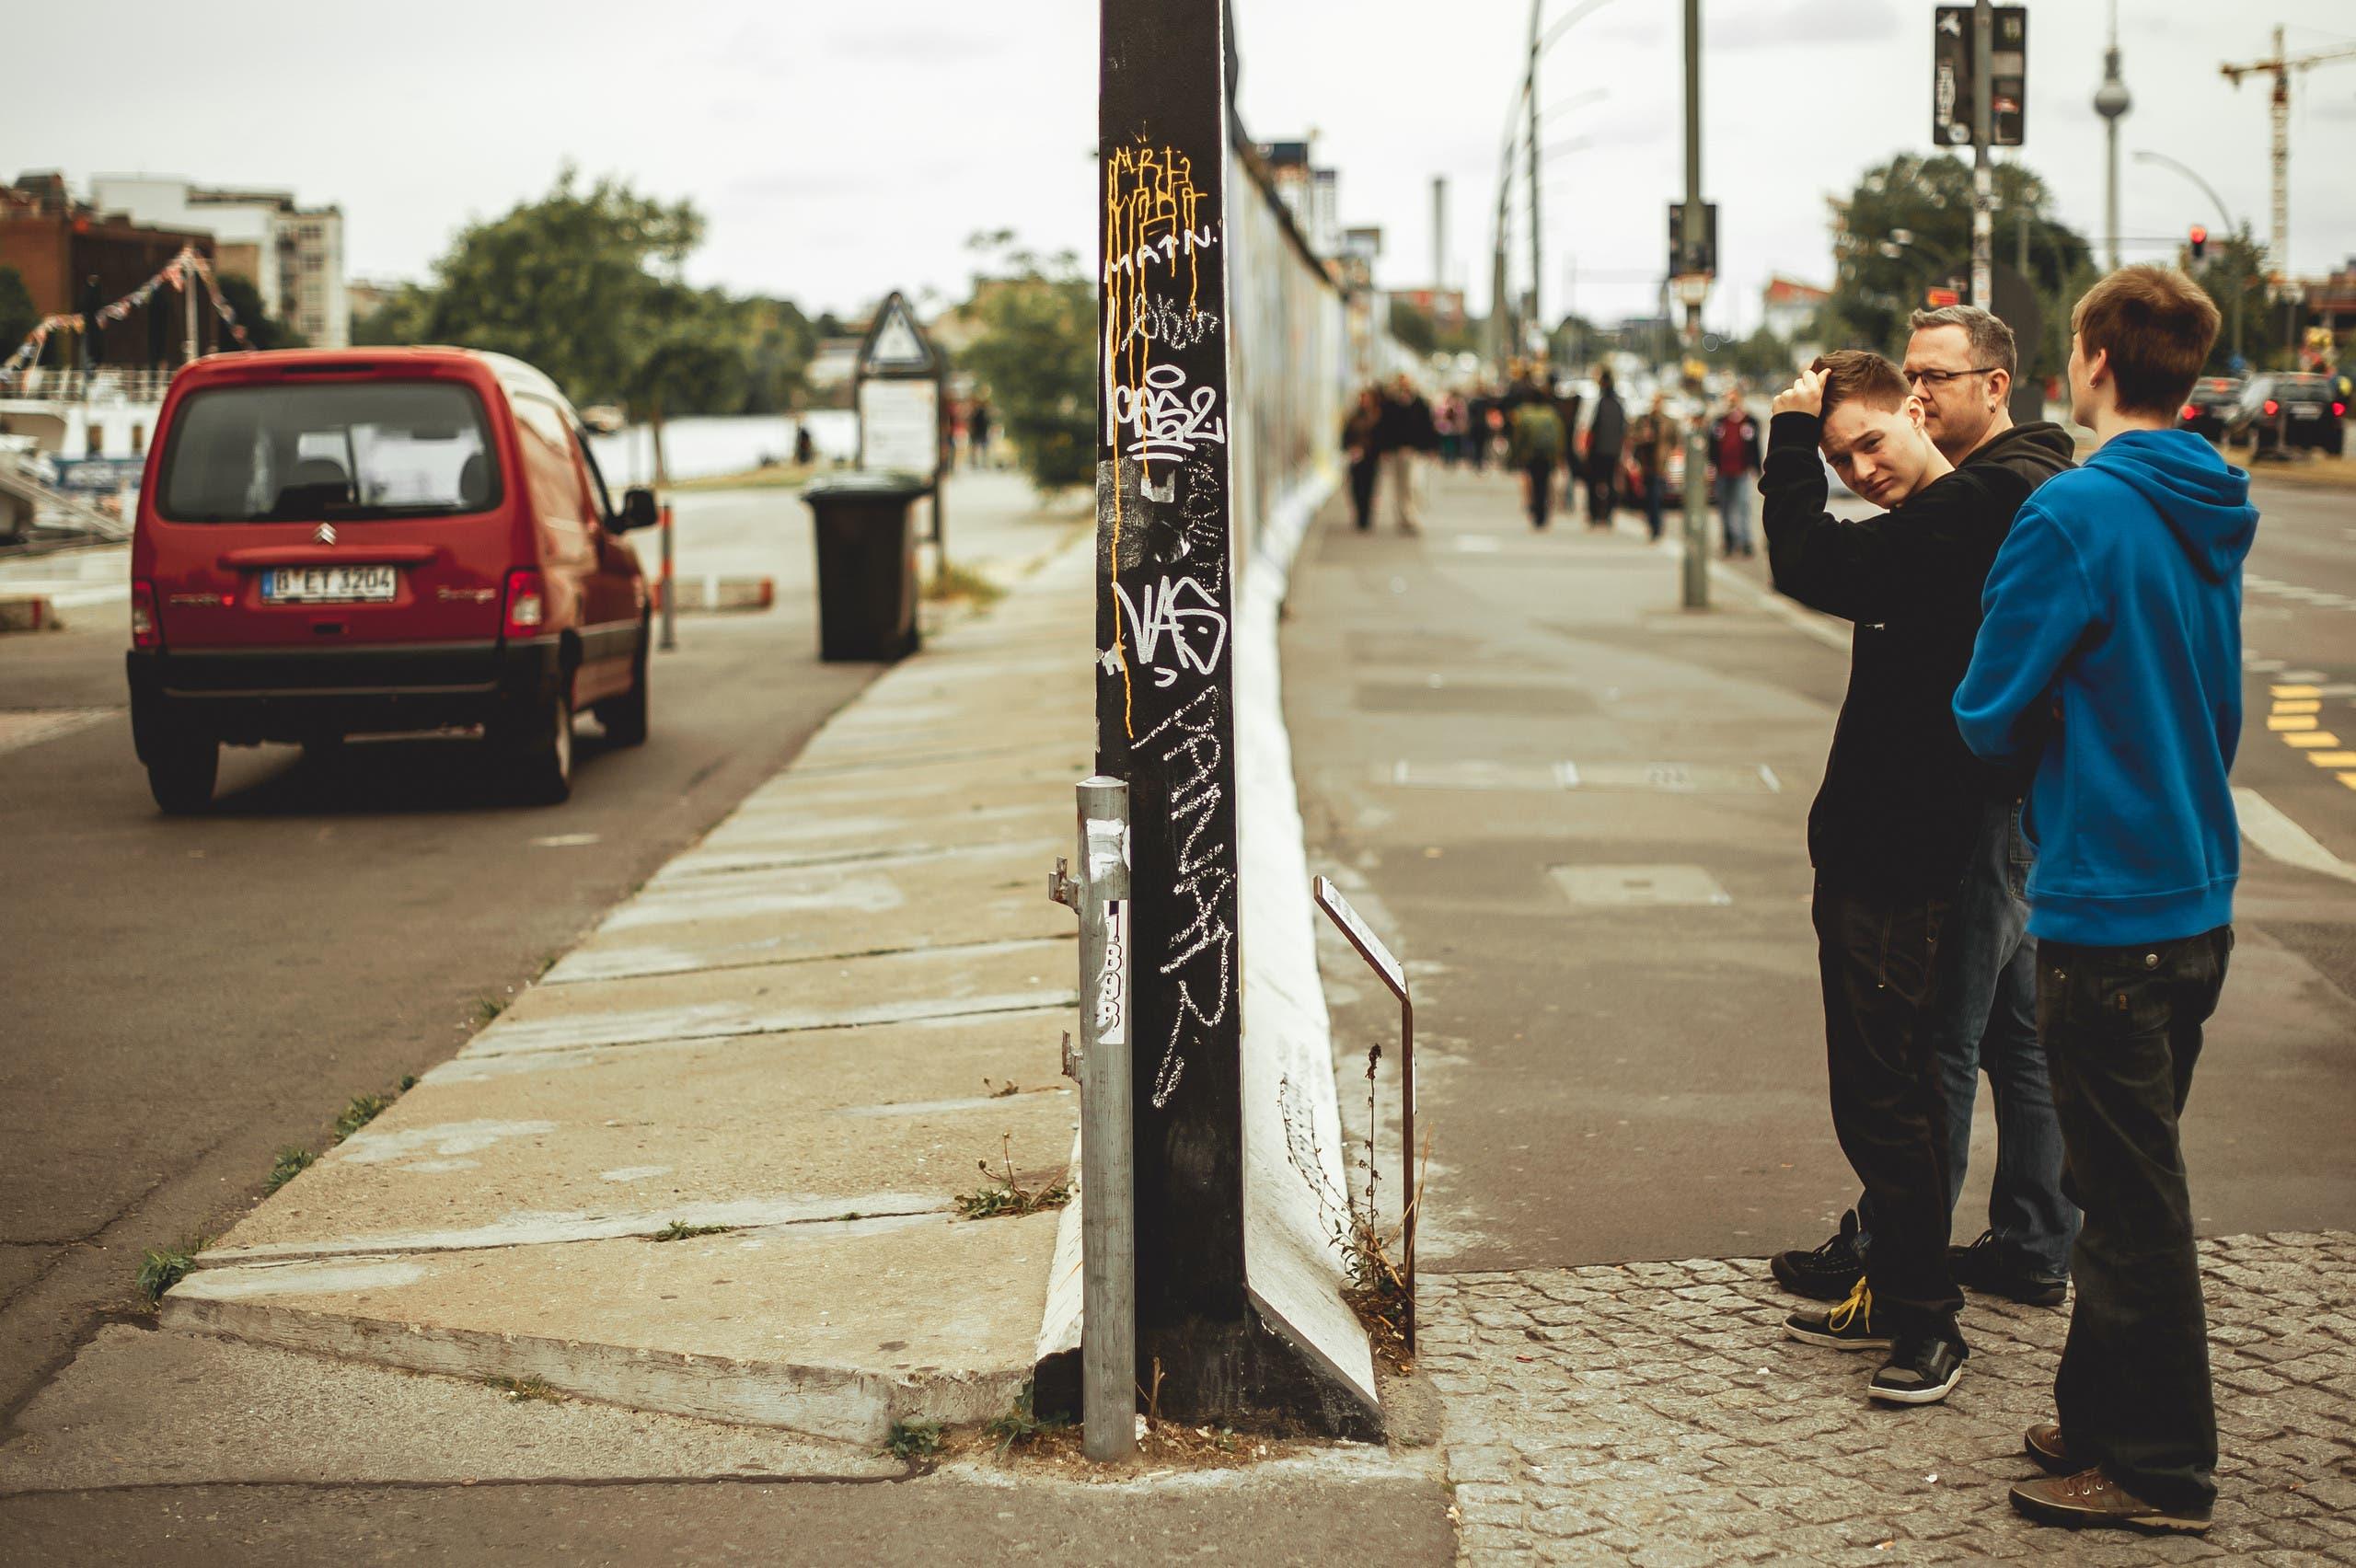 People watching the Berlin Wall. (Shutterstock)